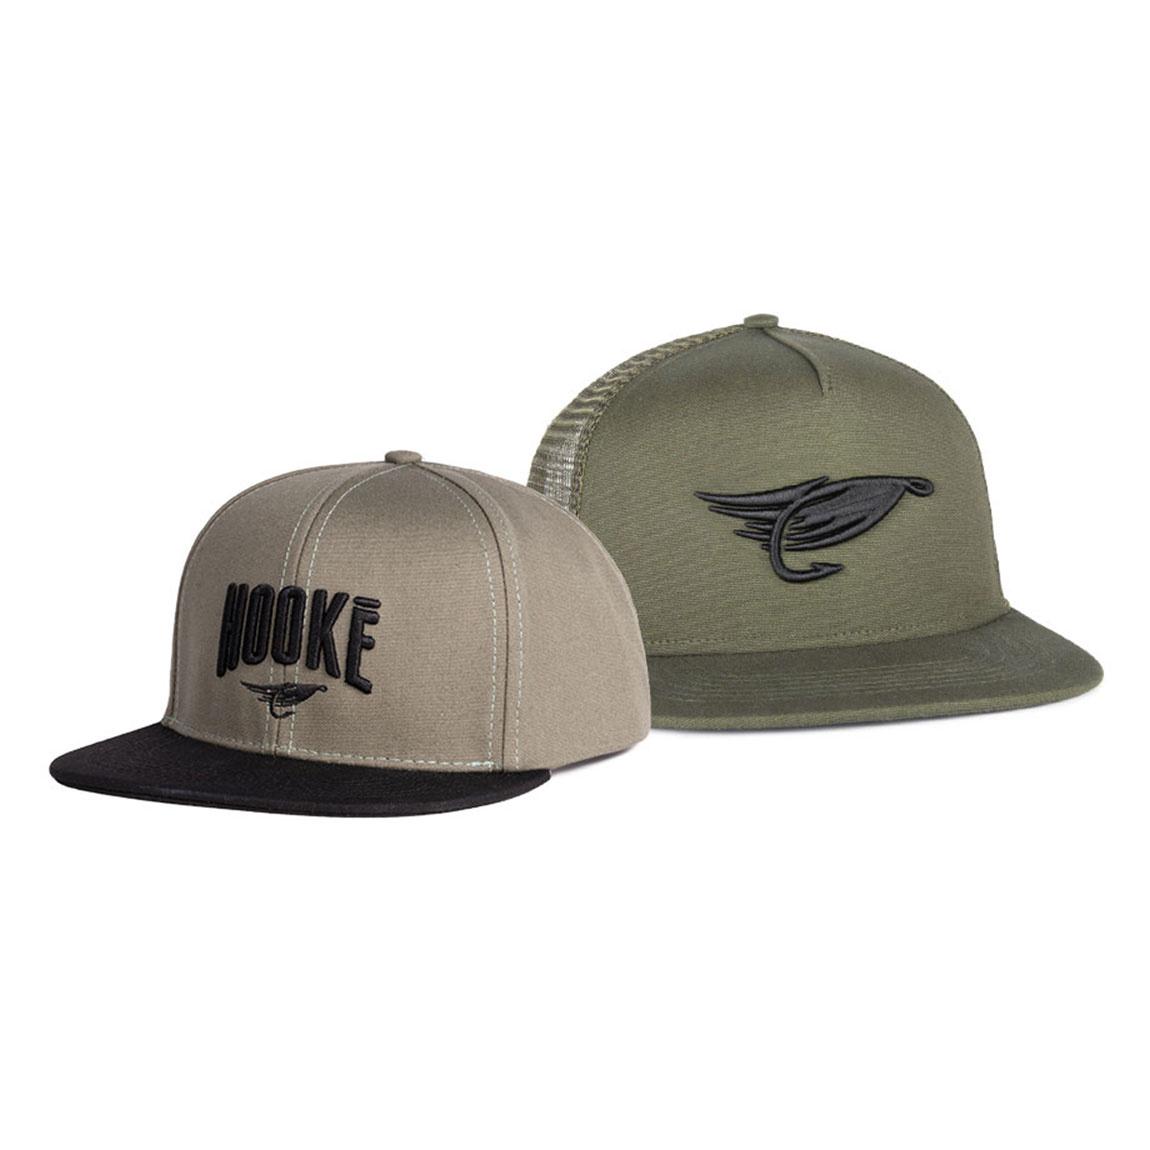 Green Caps Duo